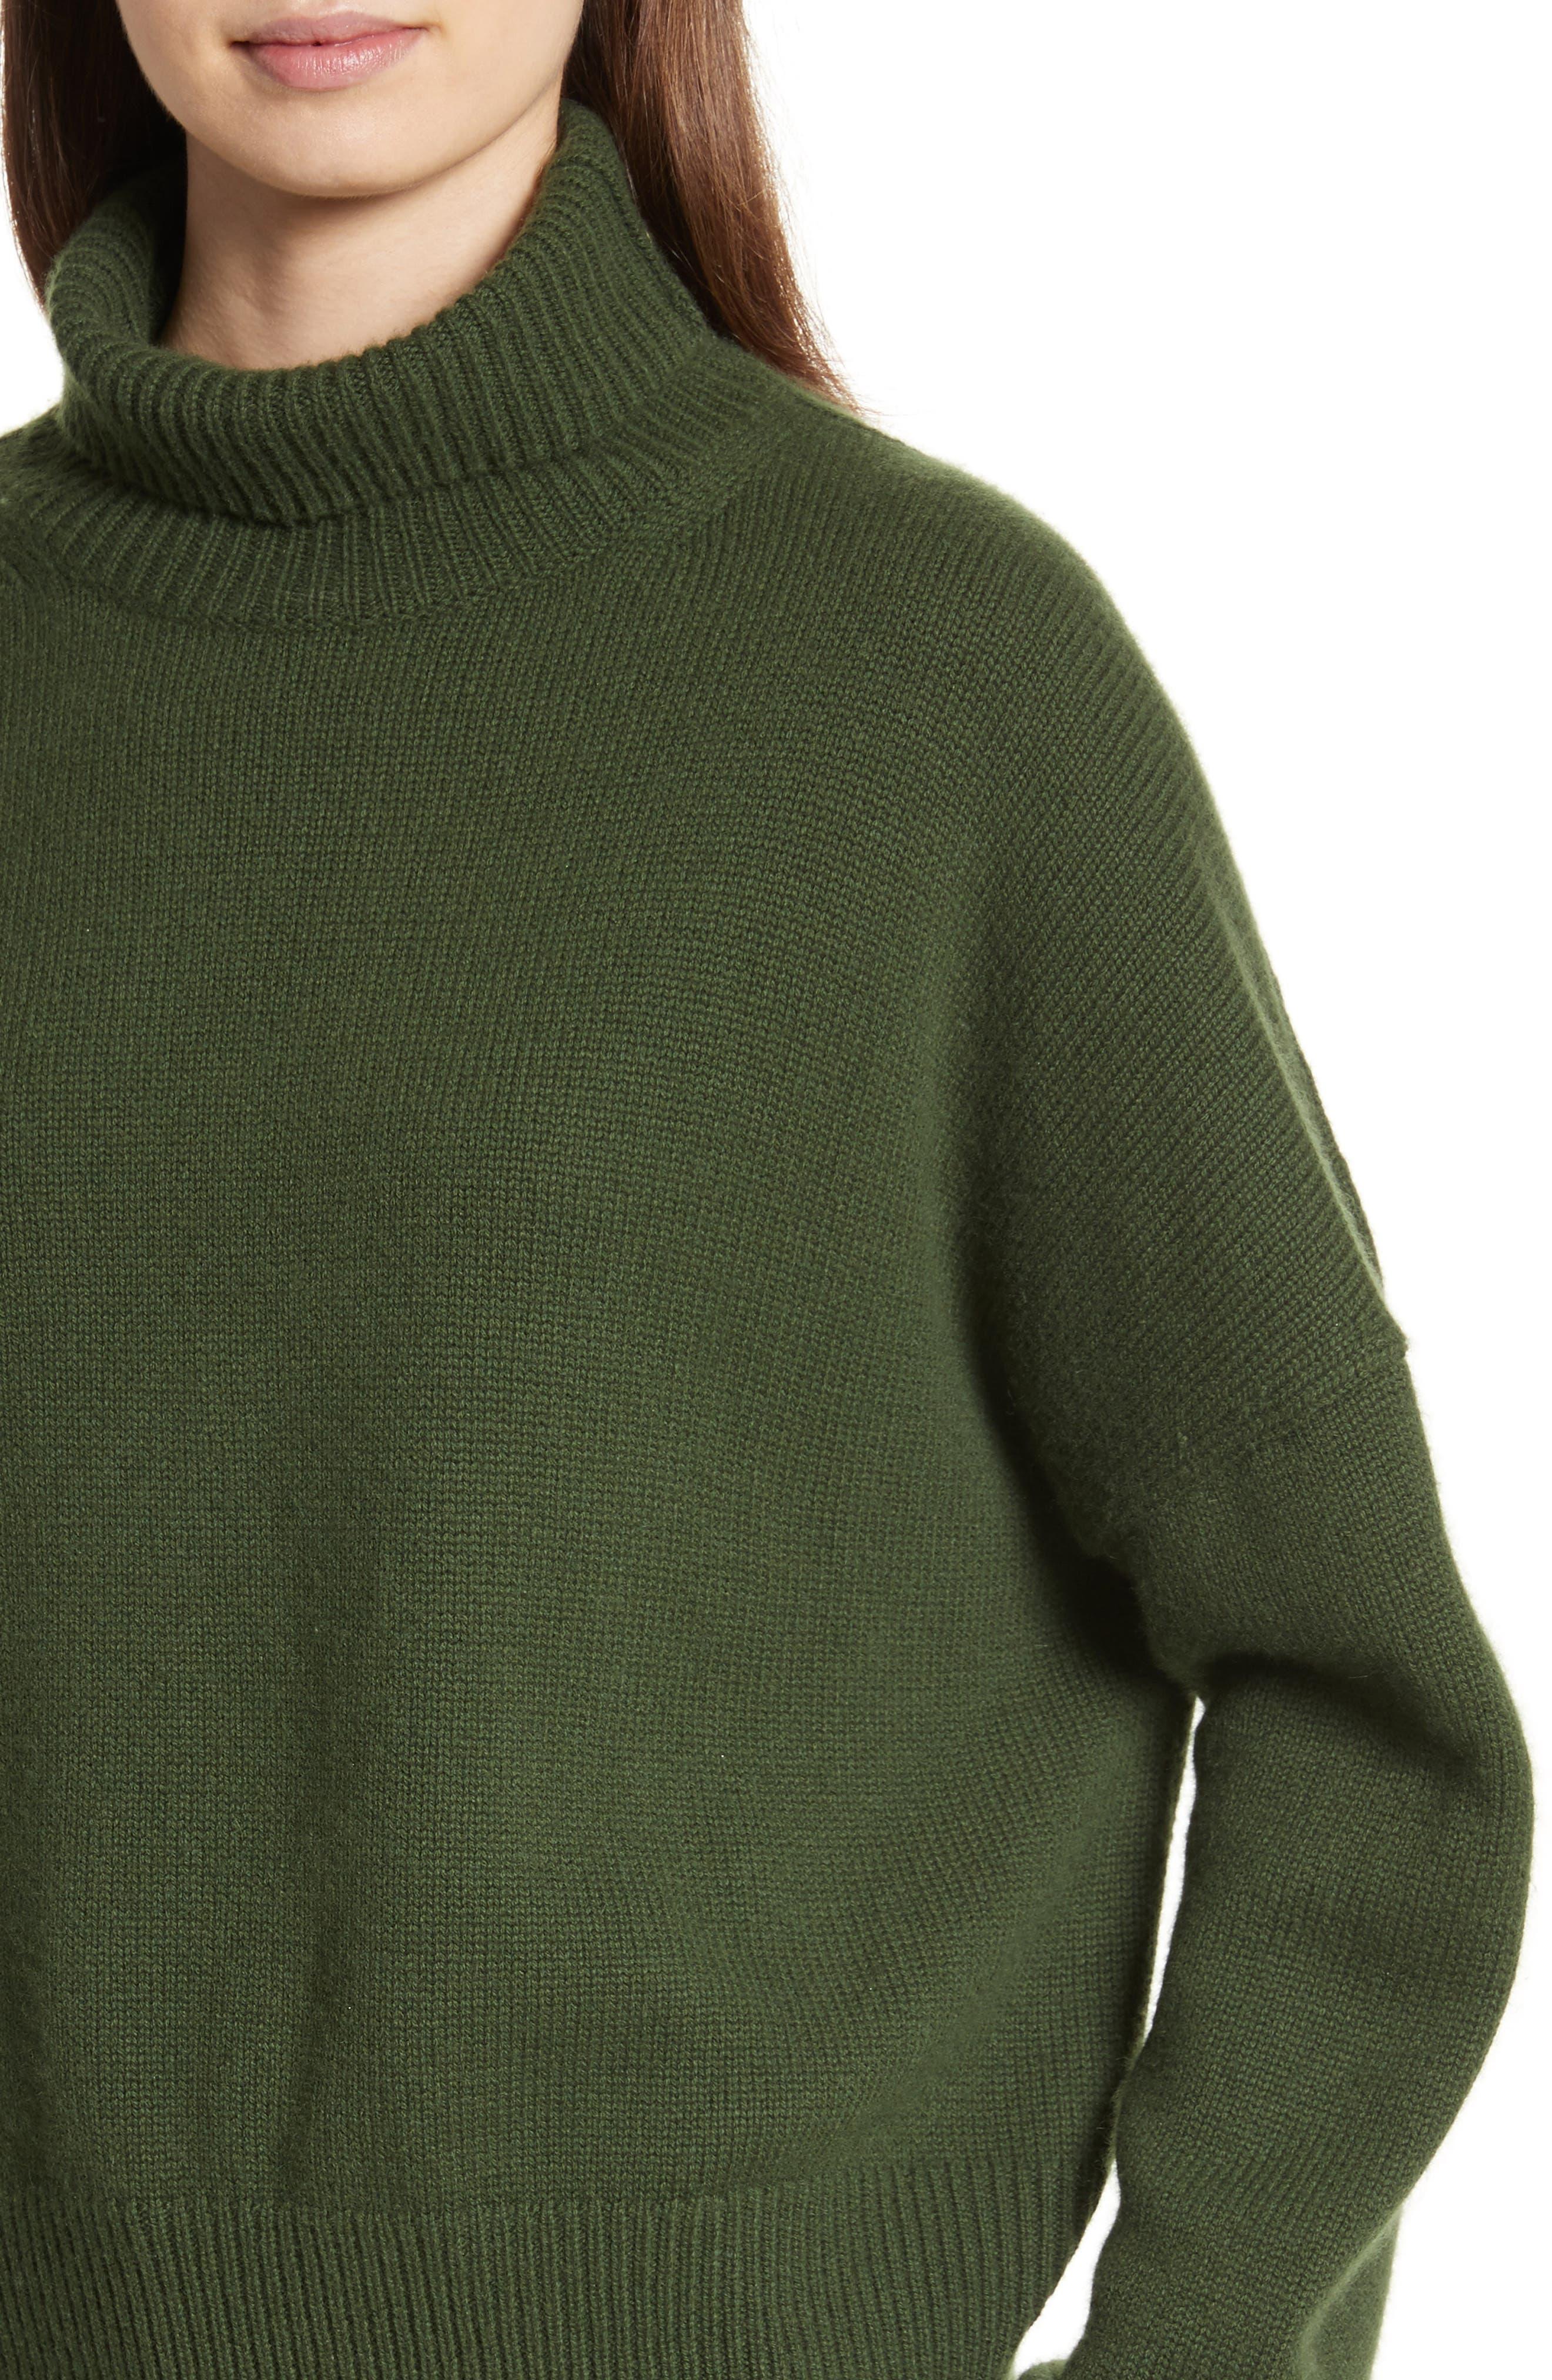 Serinda Wool & Cashmere Turtleneck Sweater,                             Alternate thumbnail 4, color,                             303